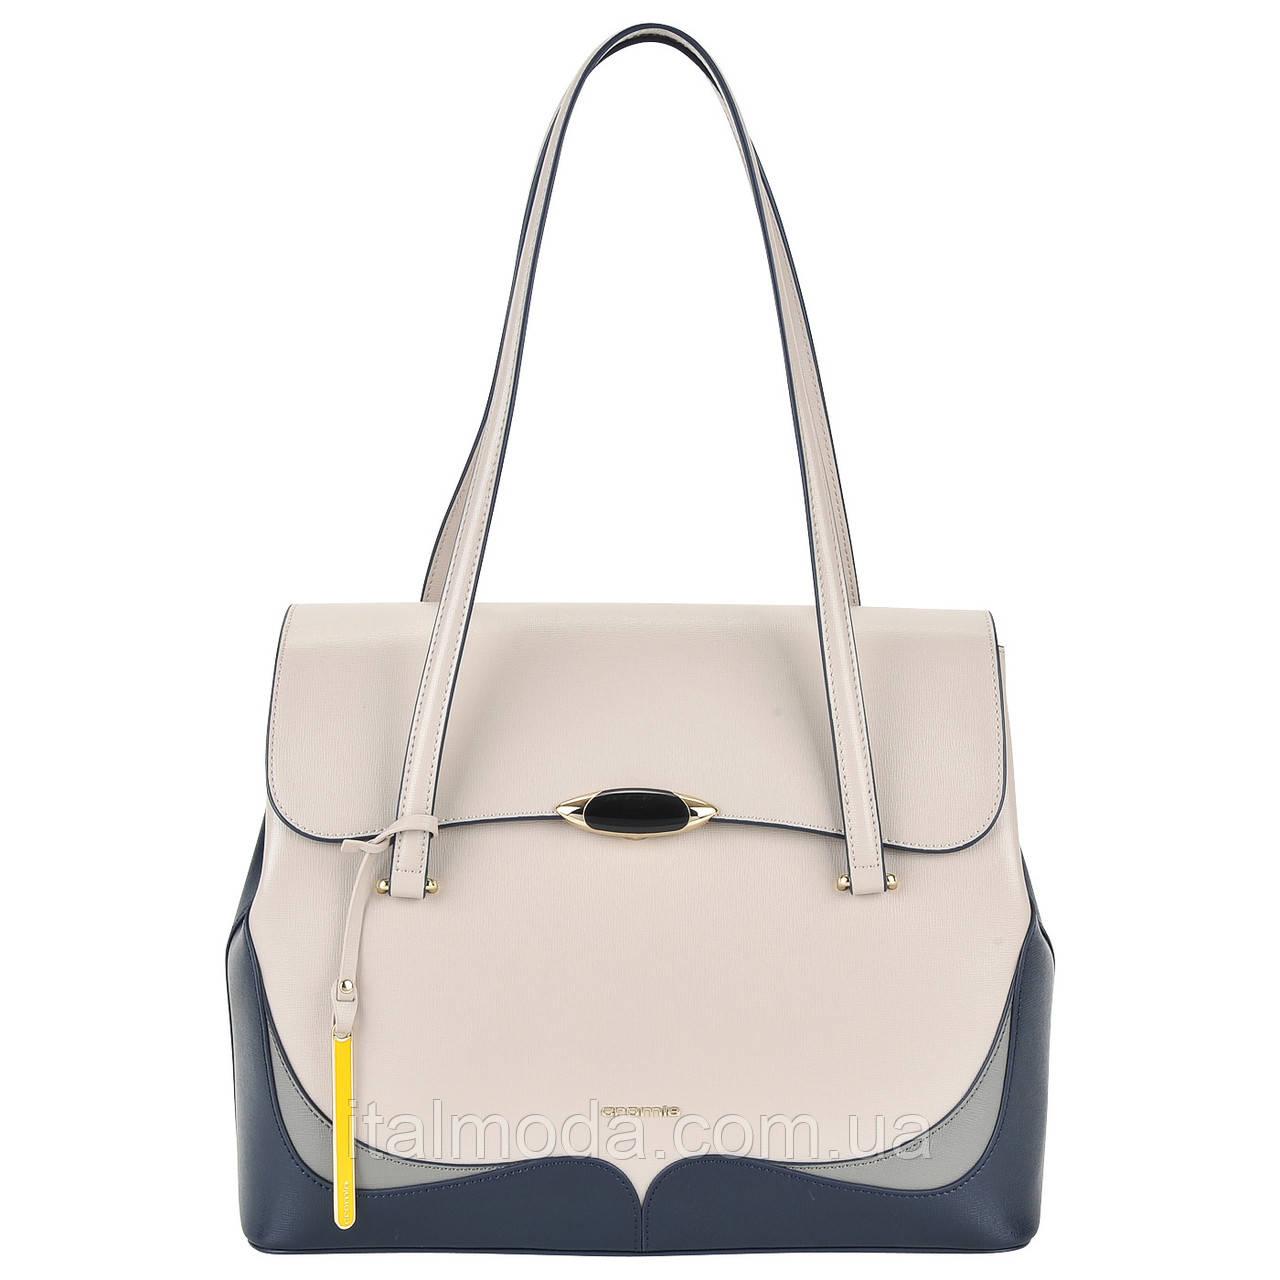 12079521f453 Женская сумка Cromia (Кромия) 1403422 - Интернет-магазин